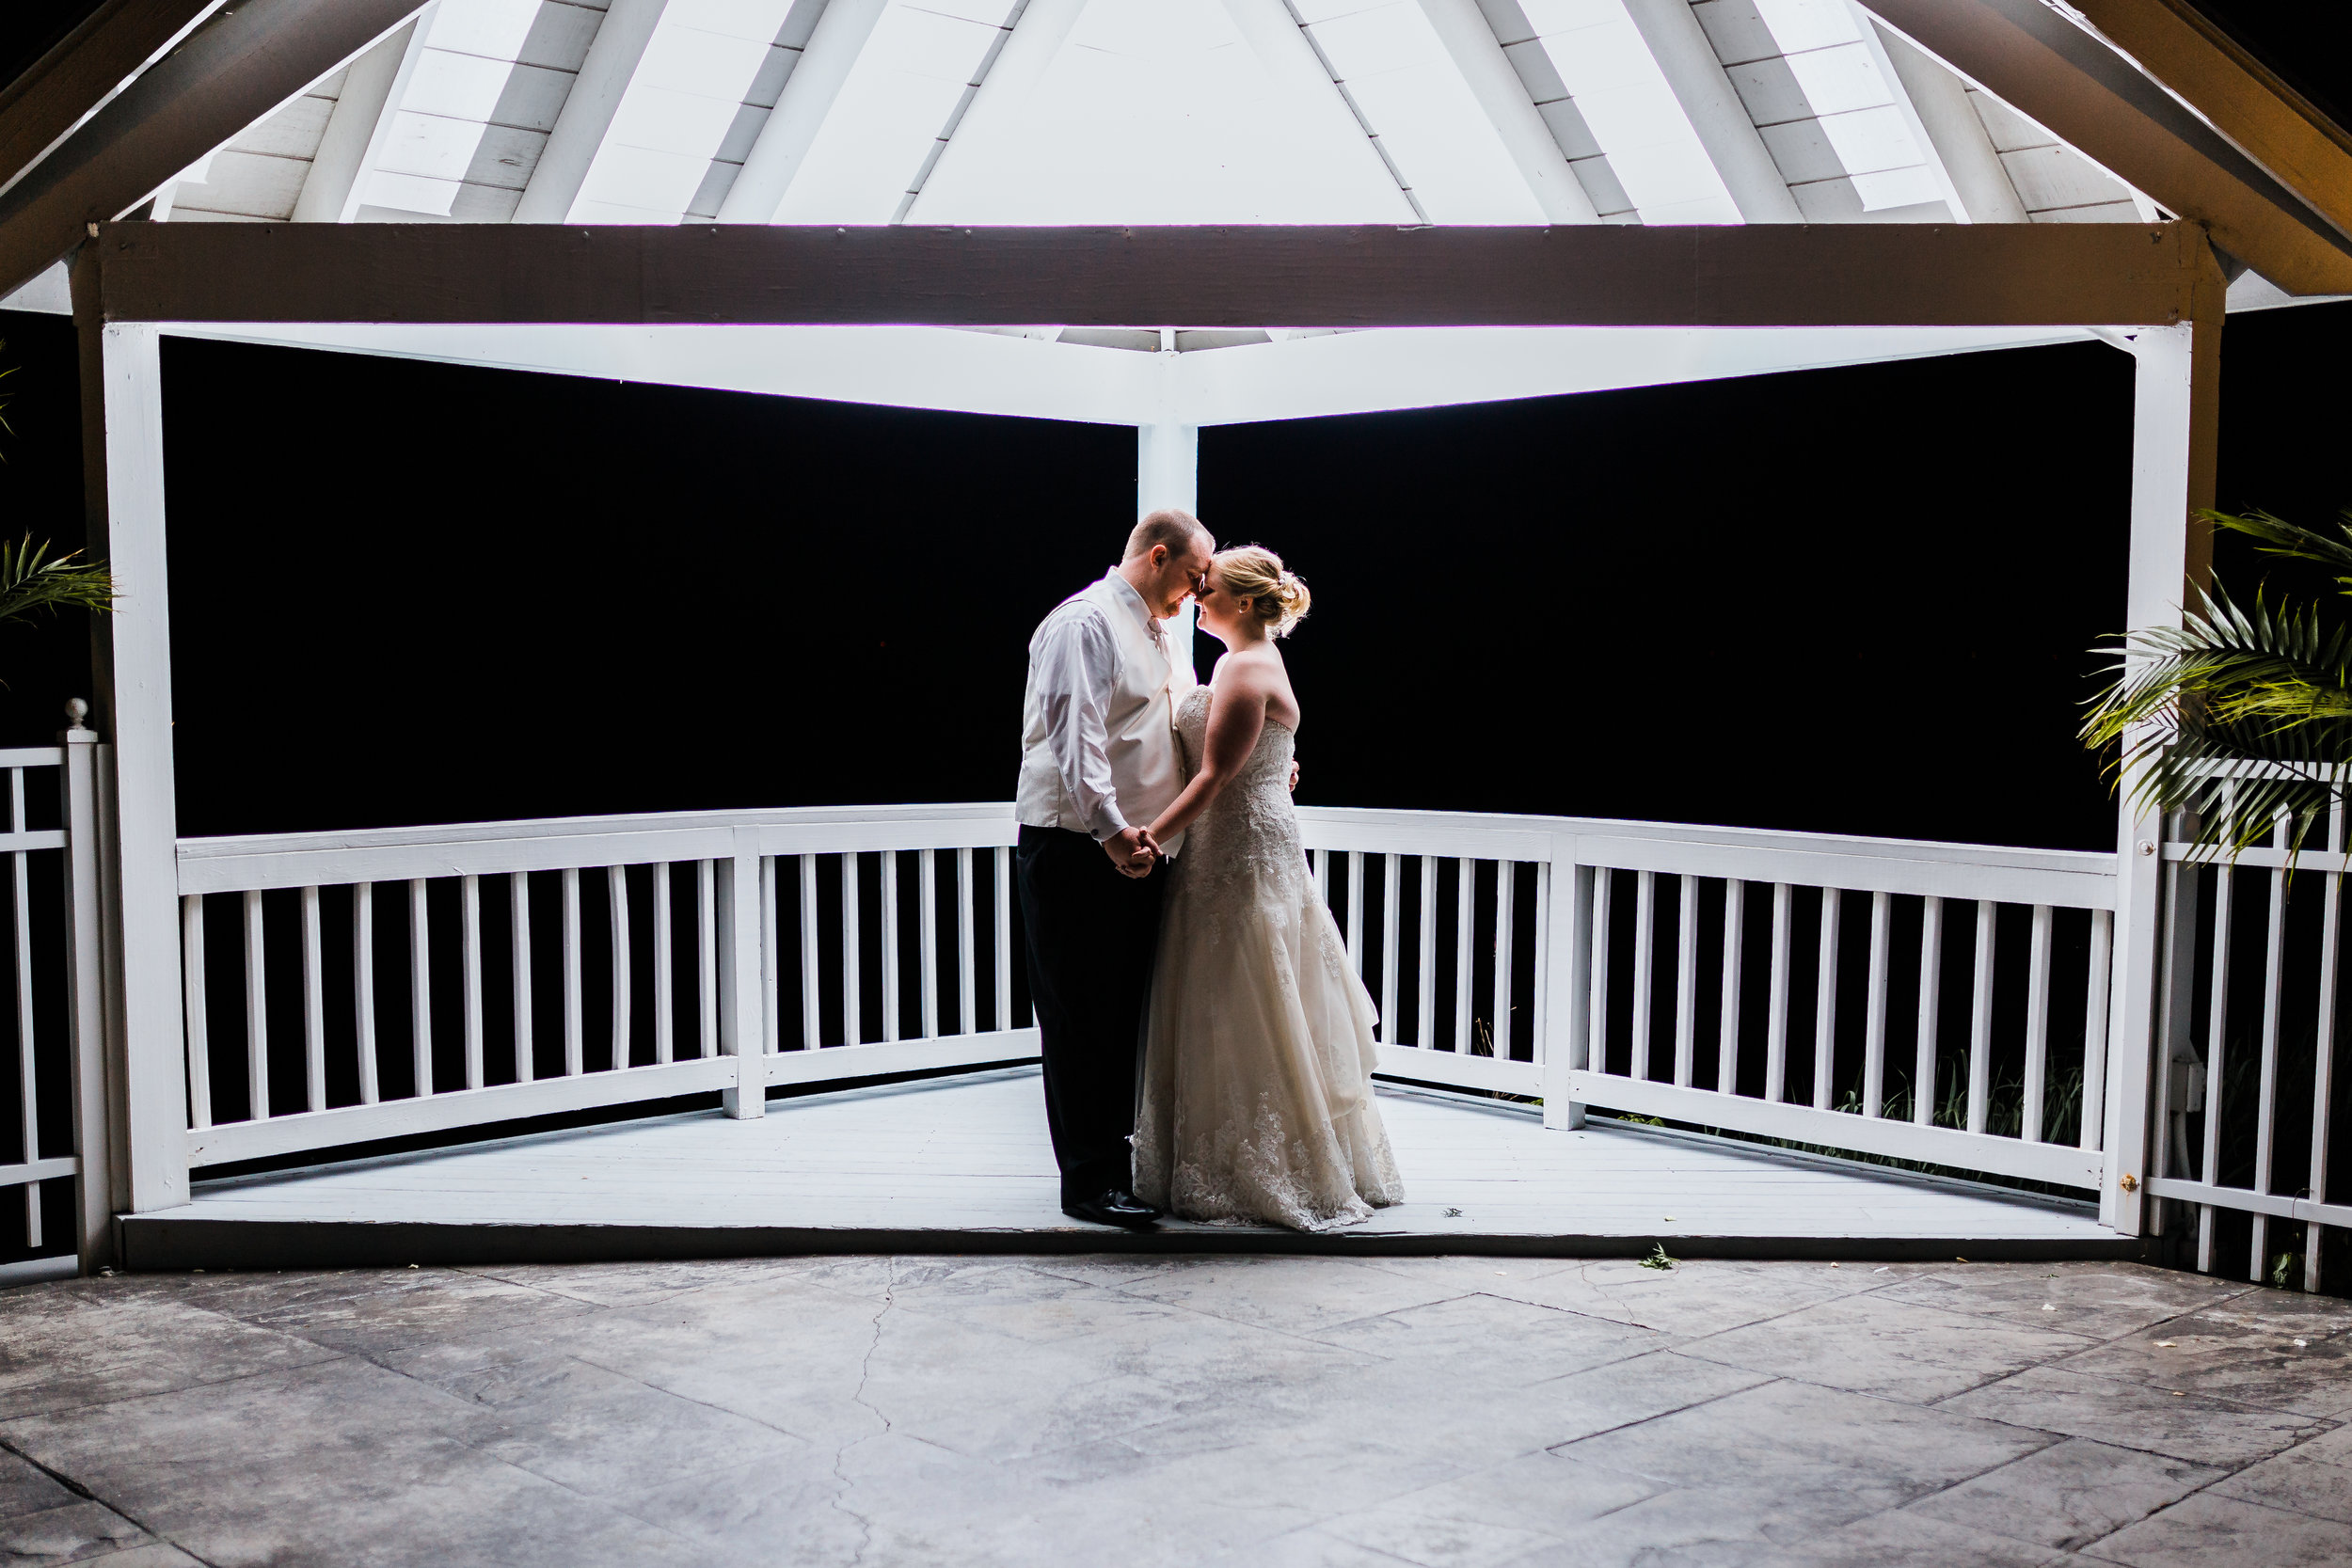 night photography - maryland bayside wedding - md waterfront wedding venue - best maryland wedding photographer